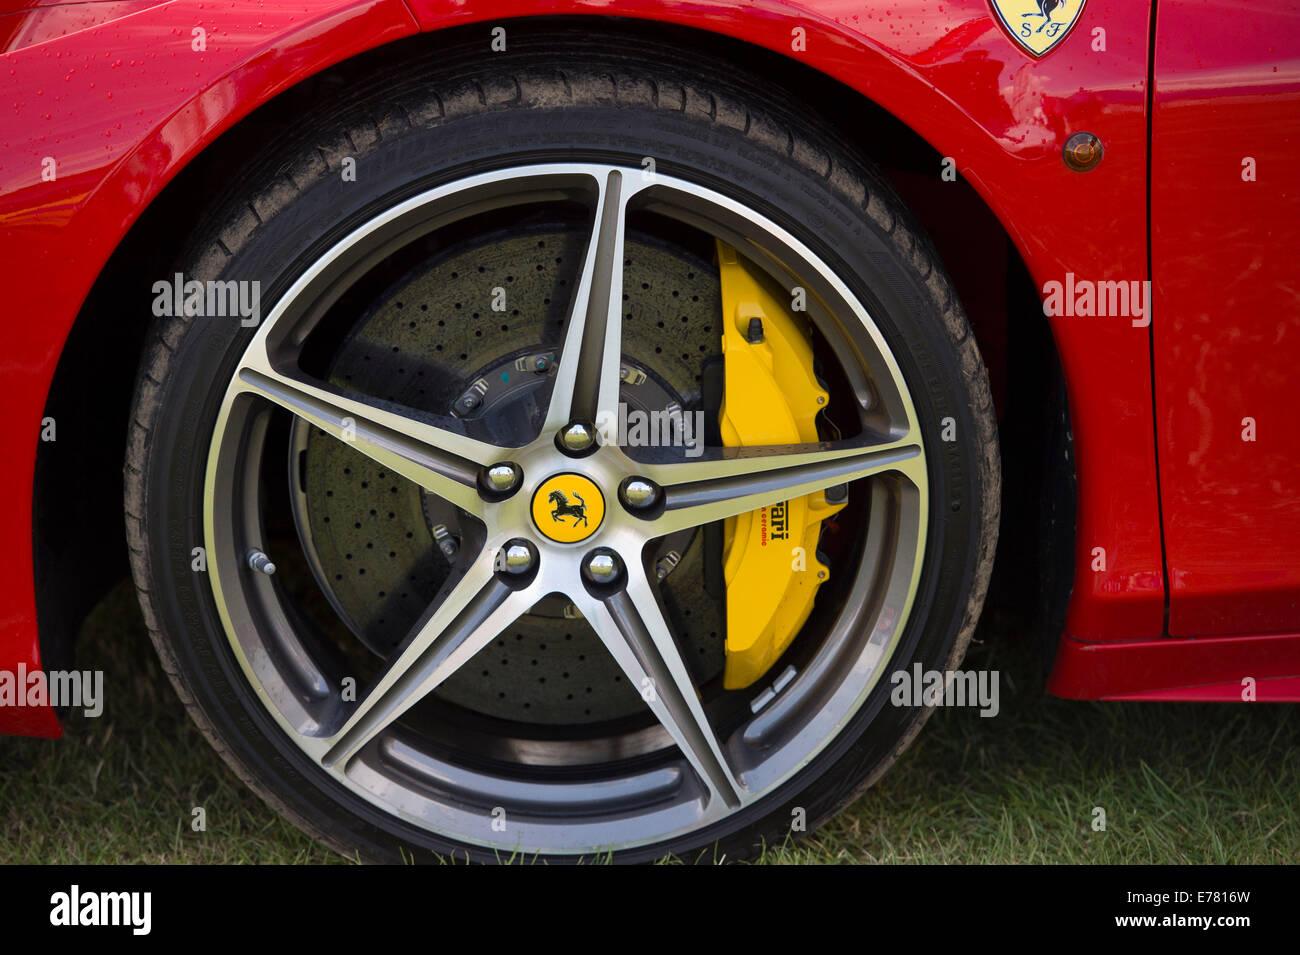 Ferrari wheels on a red Ferrari car. - Stock Image